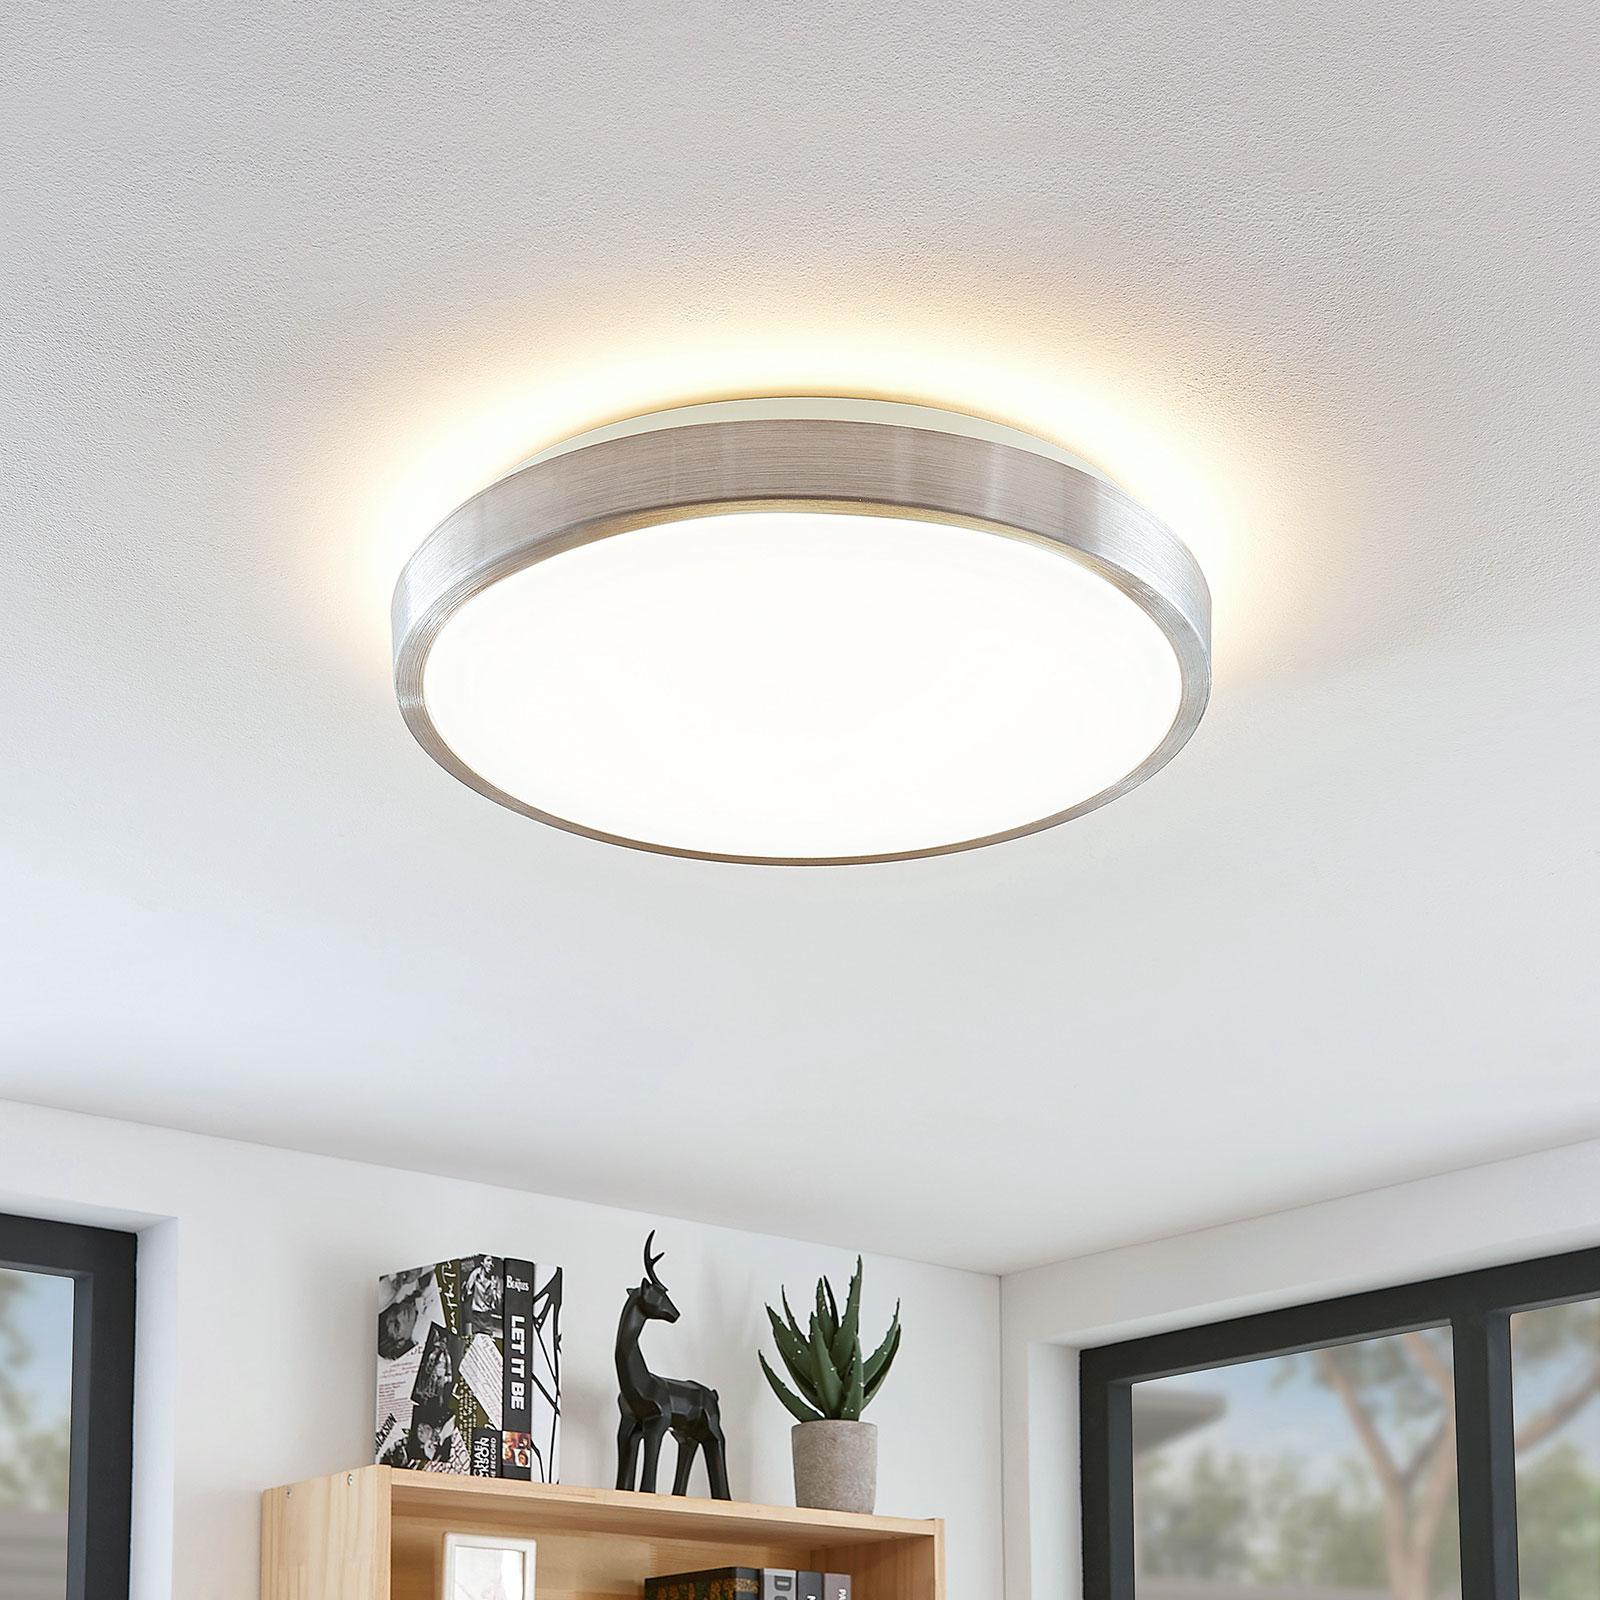 Lindby Emelie LED-Deckenlampe, rund, 42 cm